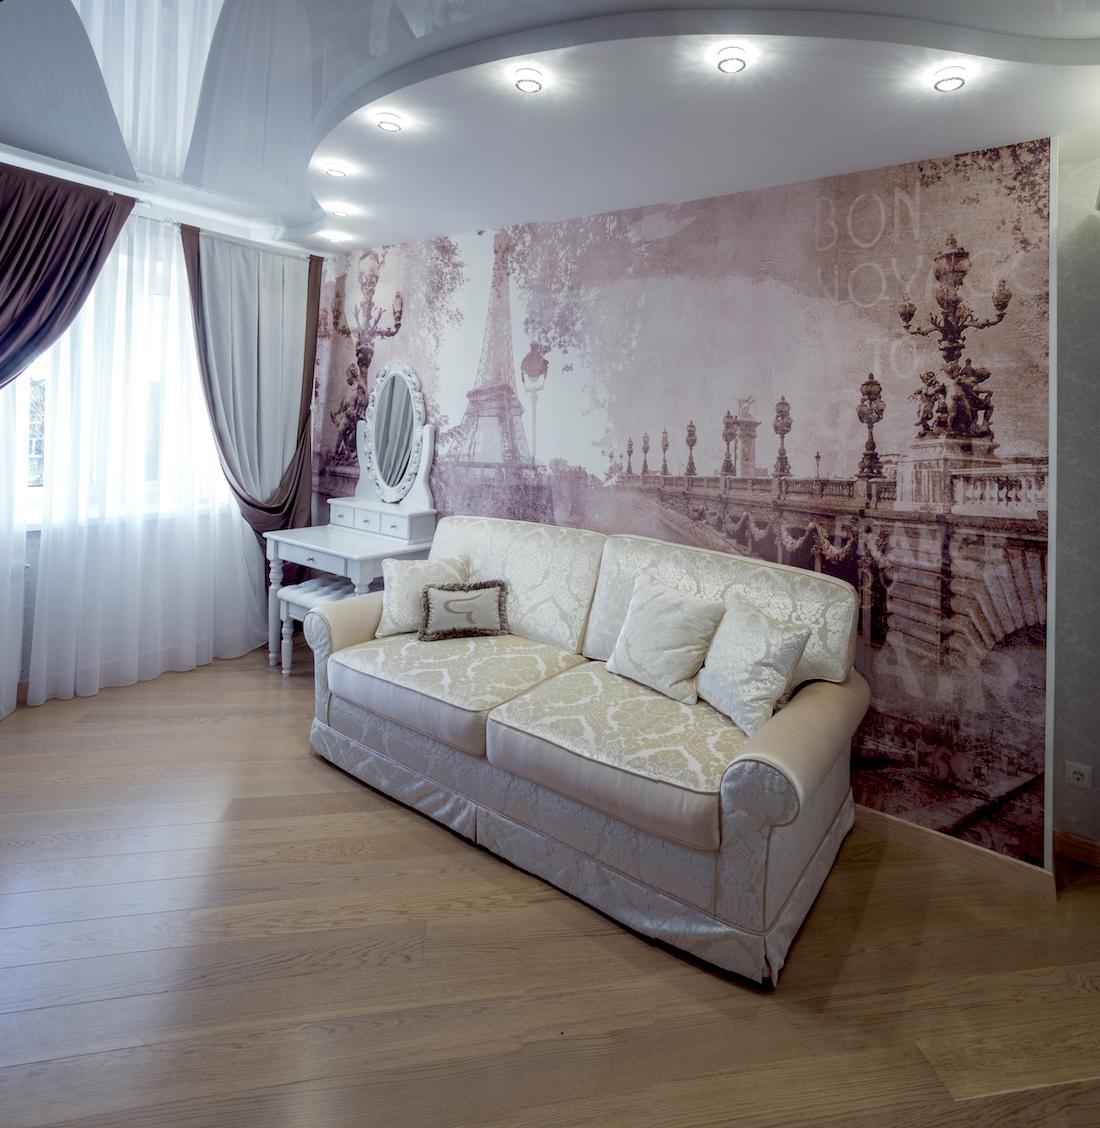 Четырехкомнатная квартира в Московской обл. Рис. 31